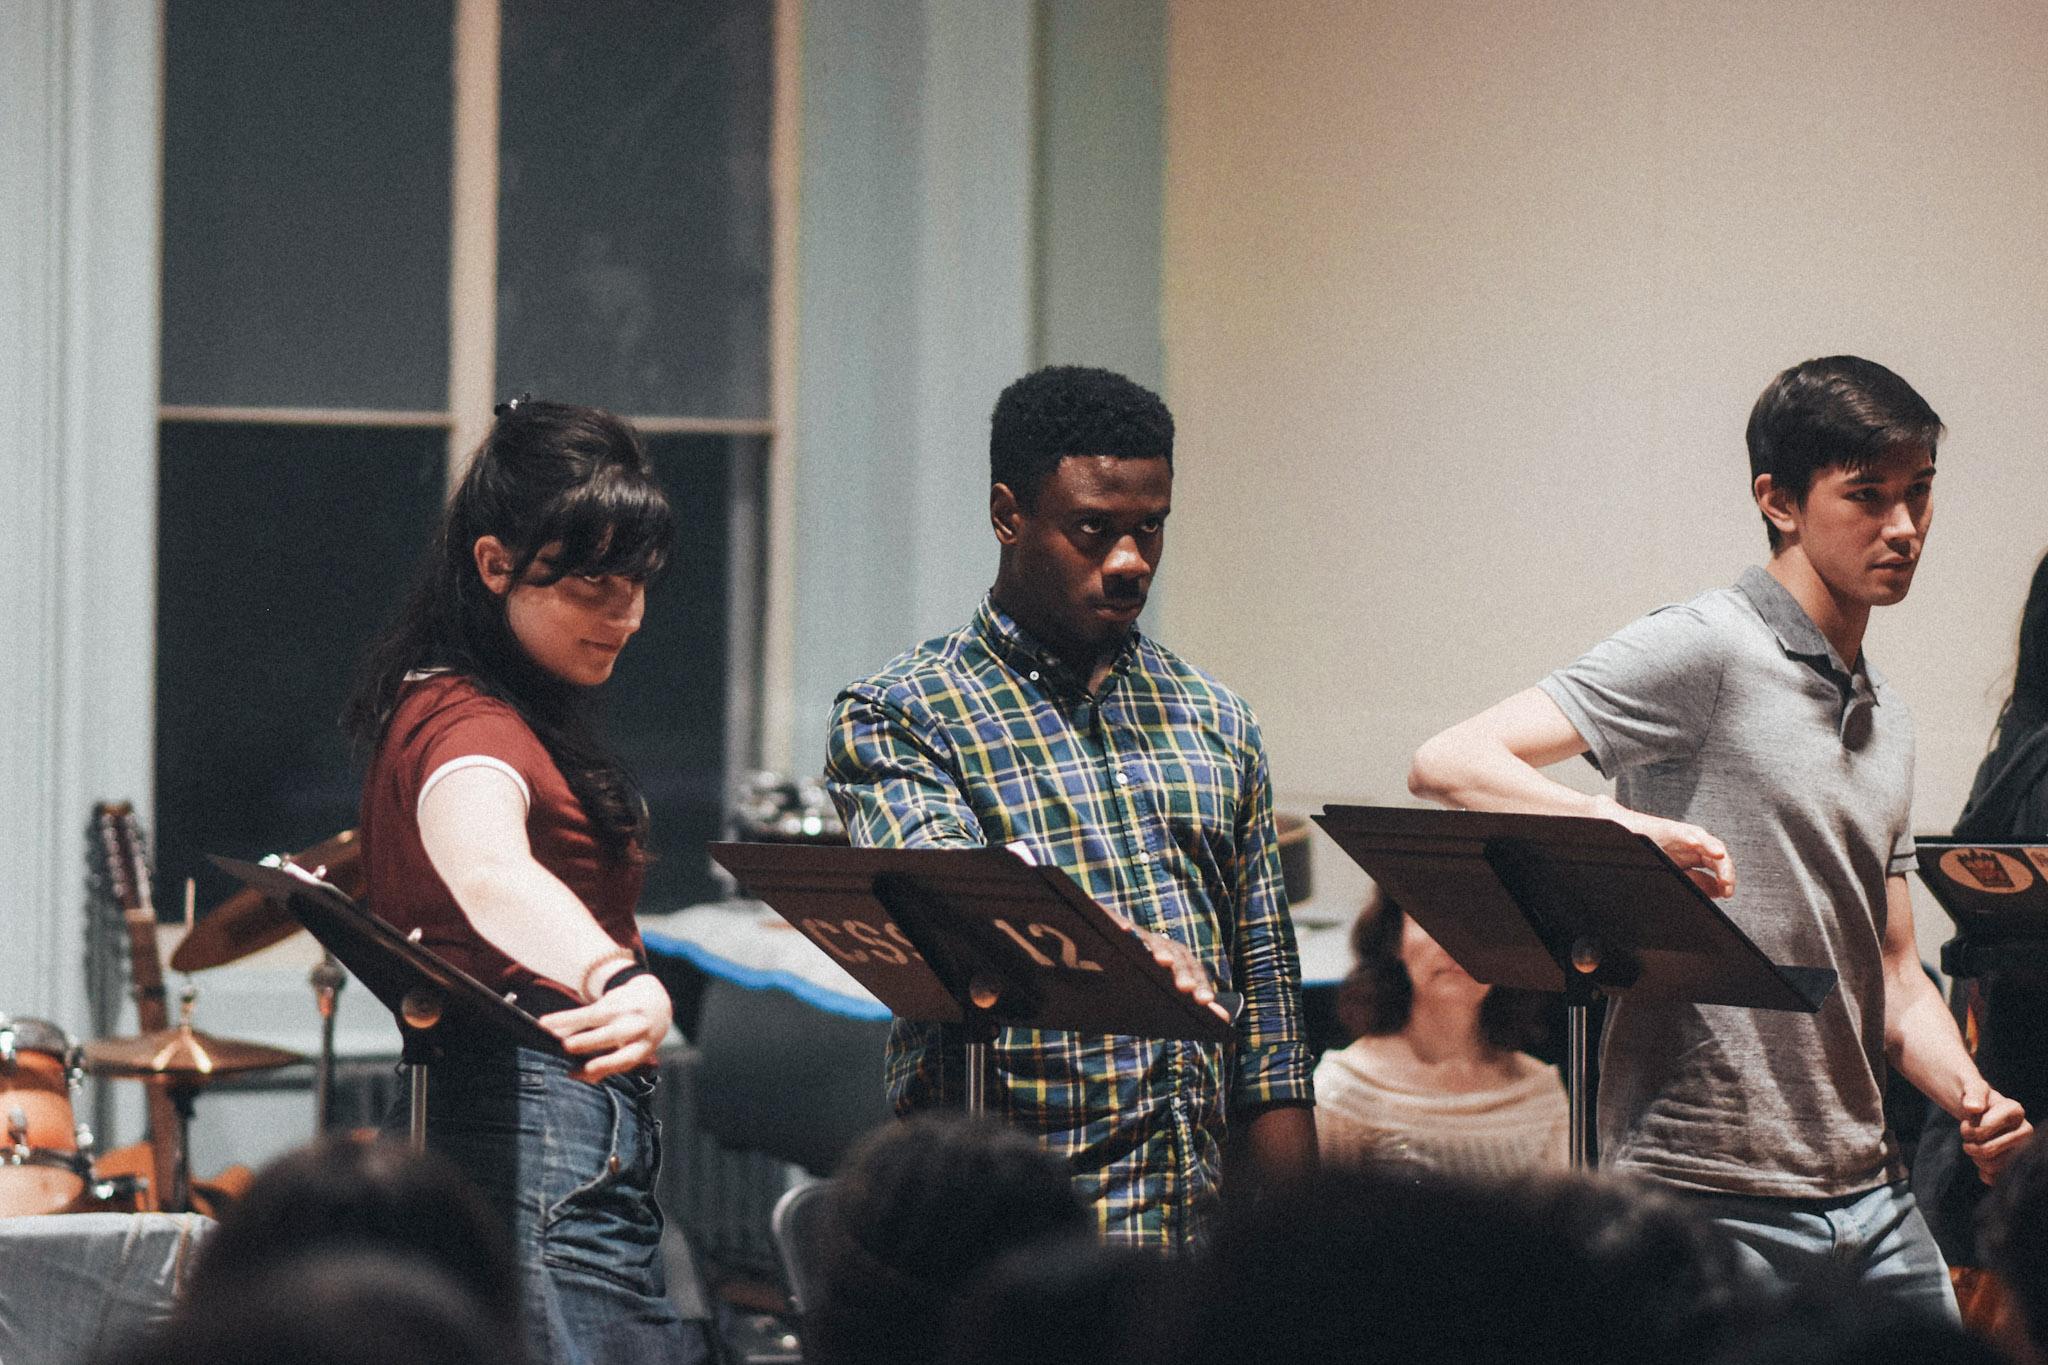 Liba Vaynberg, Marchánt Davis, and Connor Johnston // Photo by Kyle Studstill